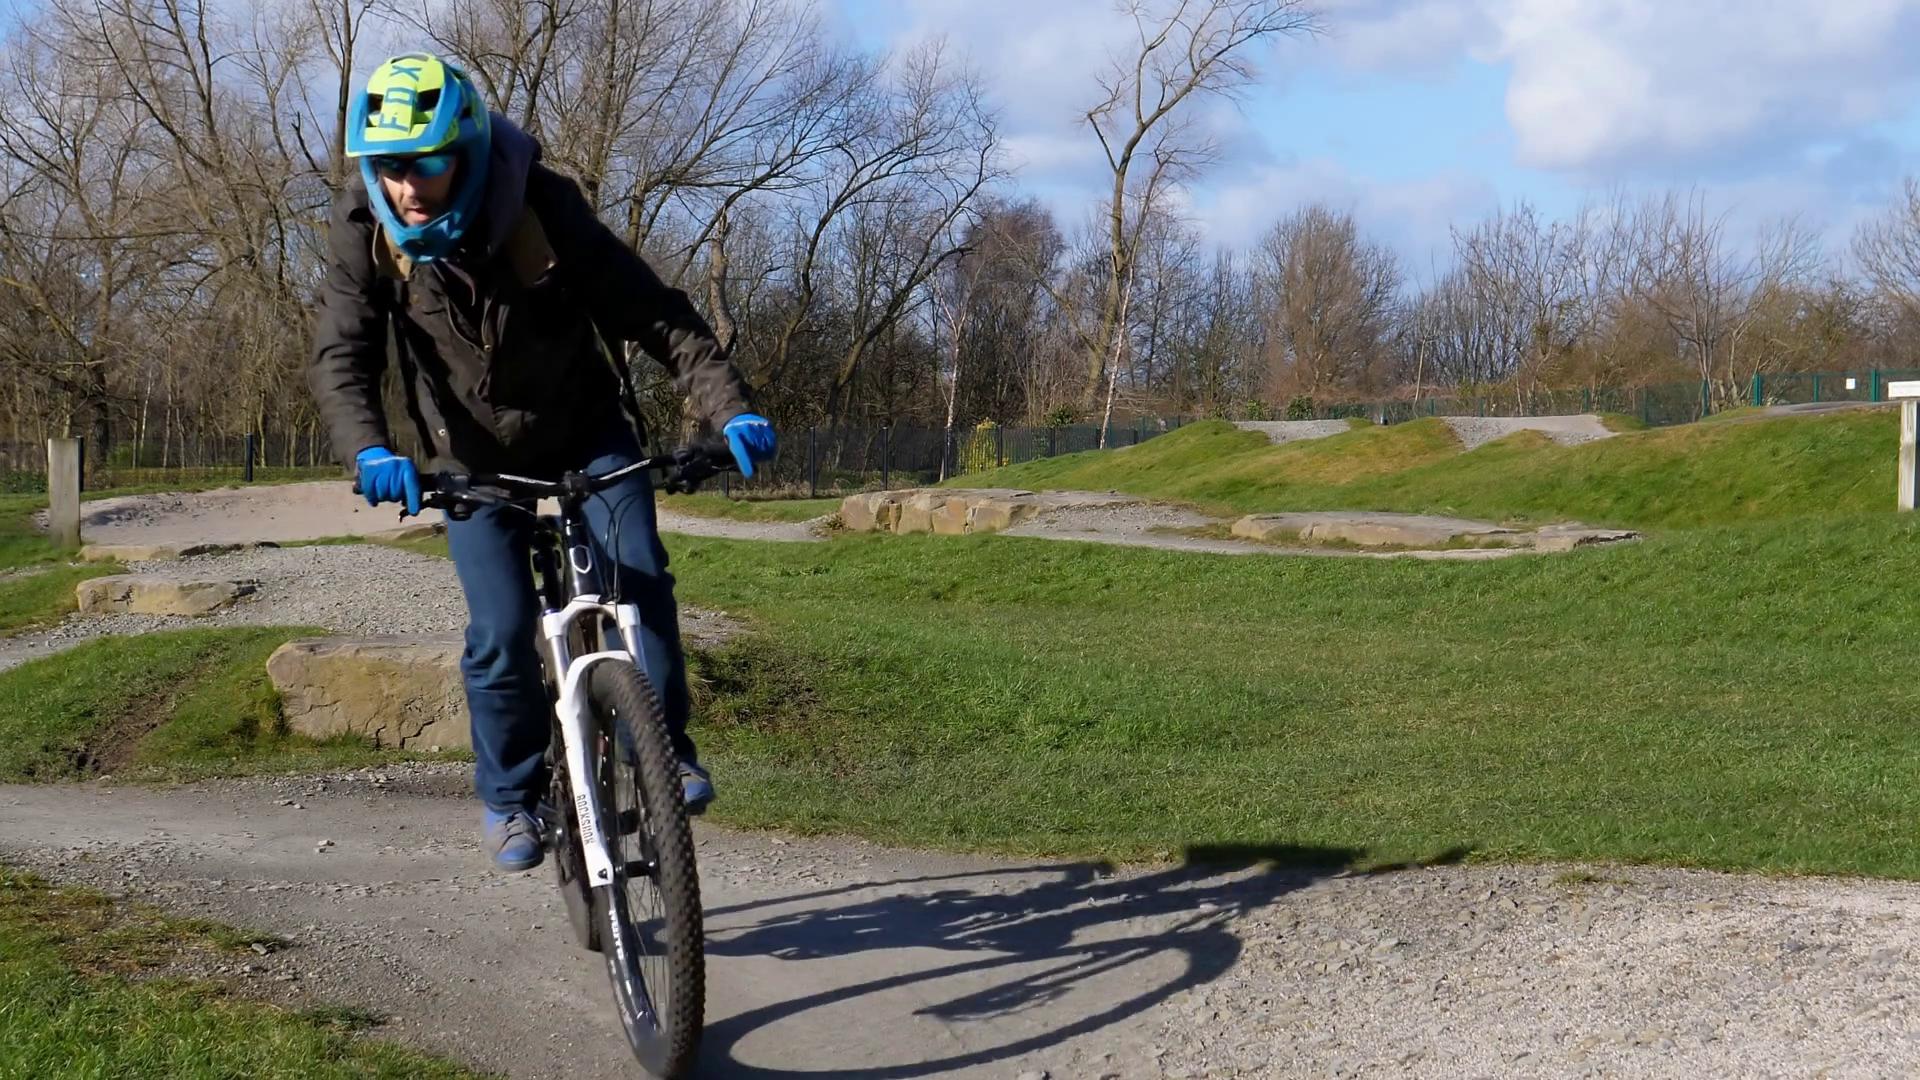 Mountain Bike Rider Shows His Skill Stock Video Footage - VideoBlocks